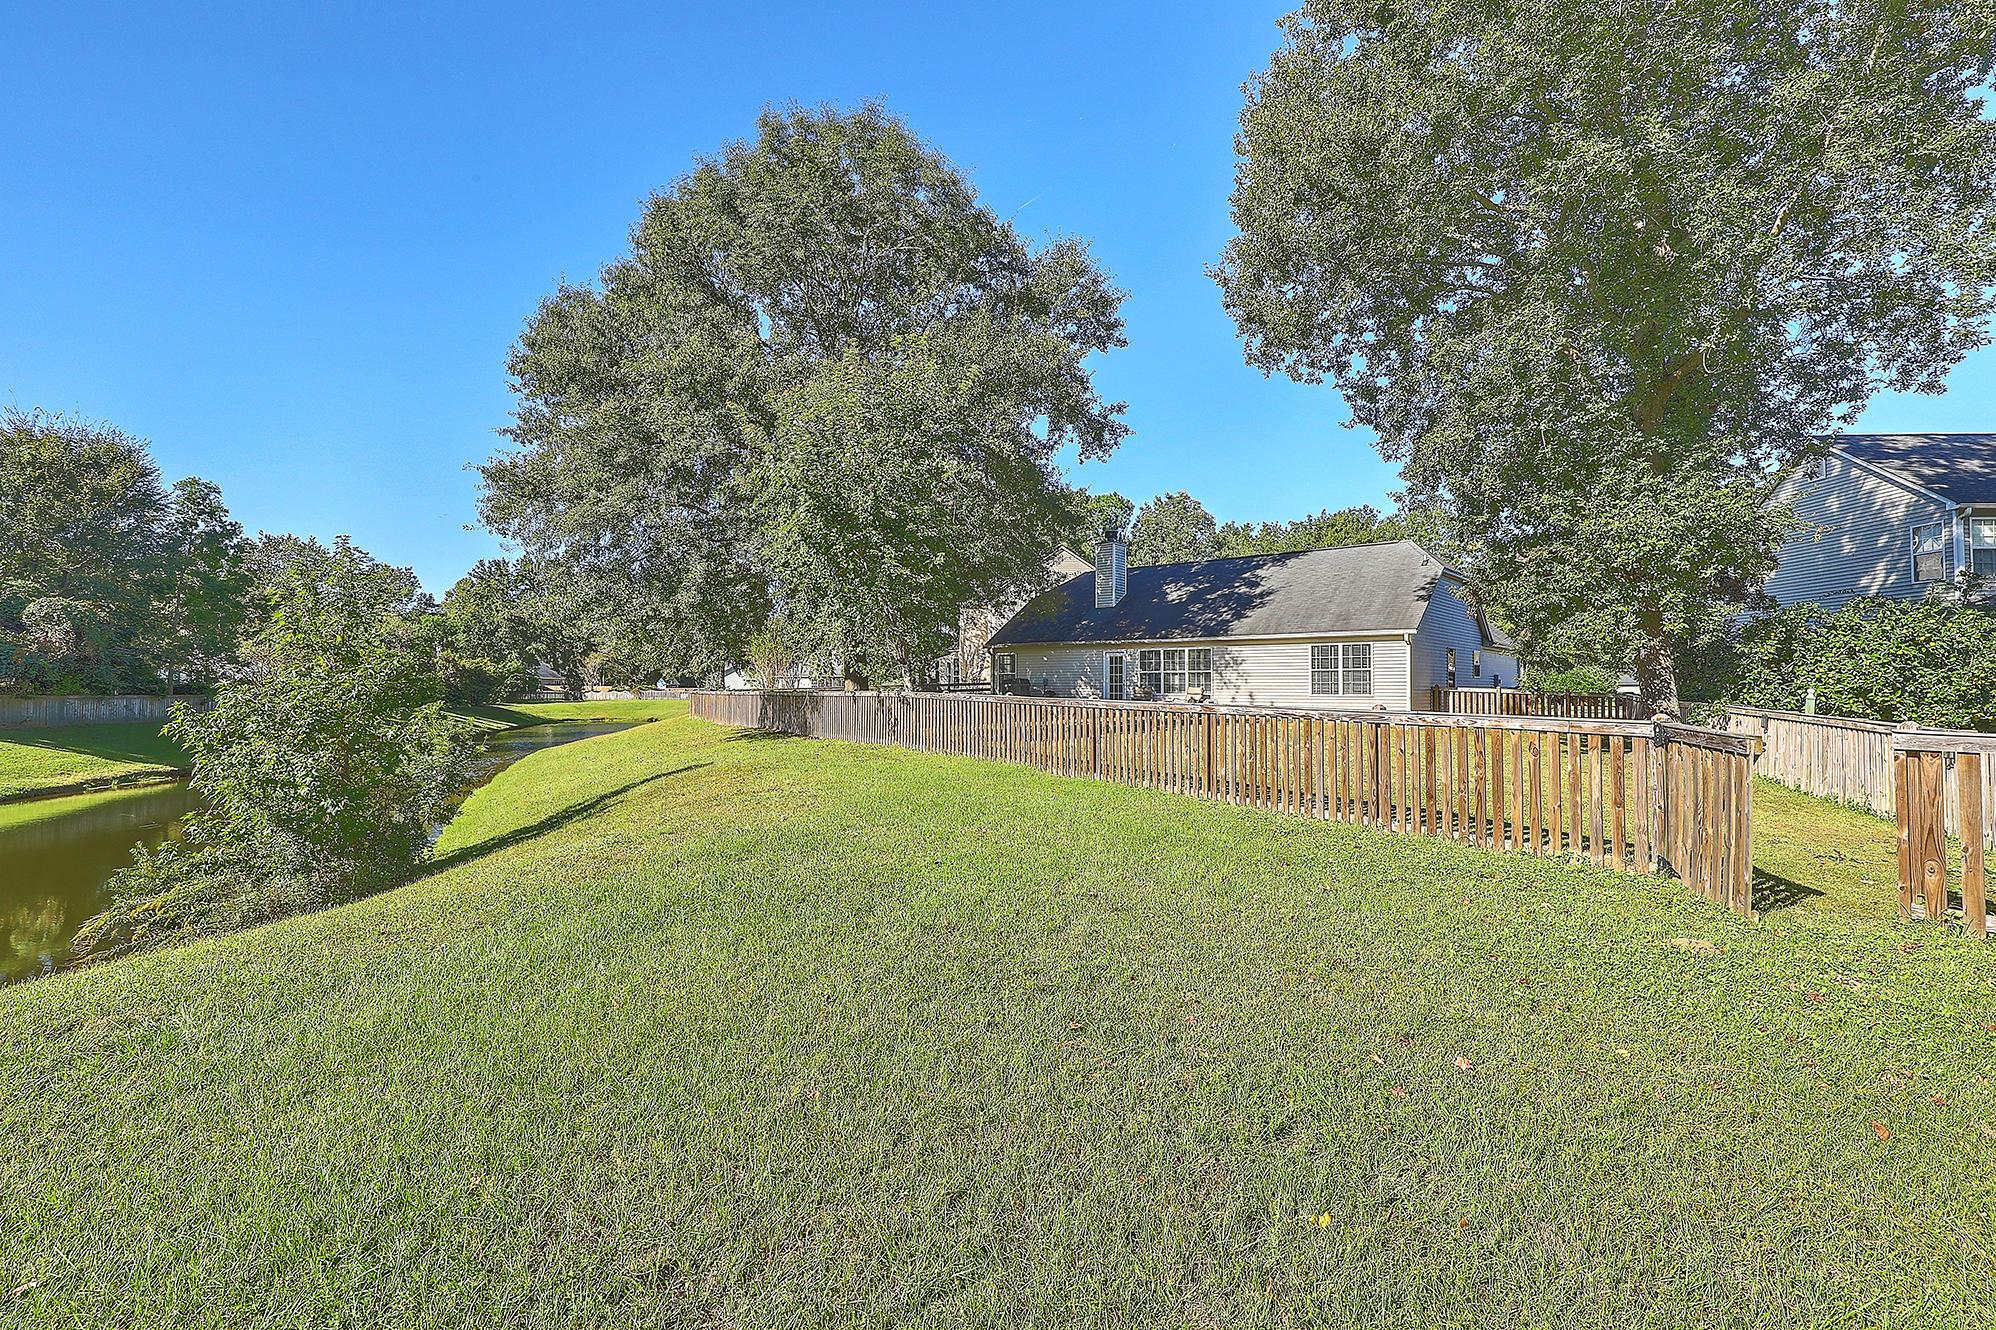 Planters Pointe Homes For Sale - 2740 Four Winds, Mount Pleasant, SC - 28